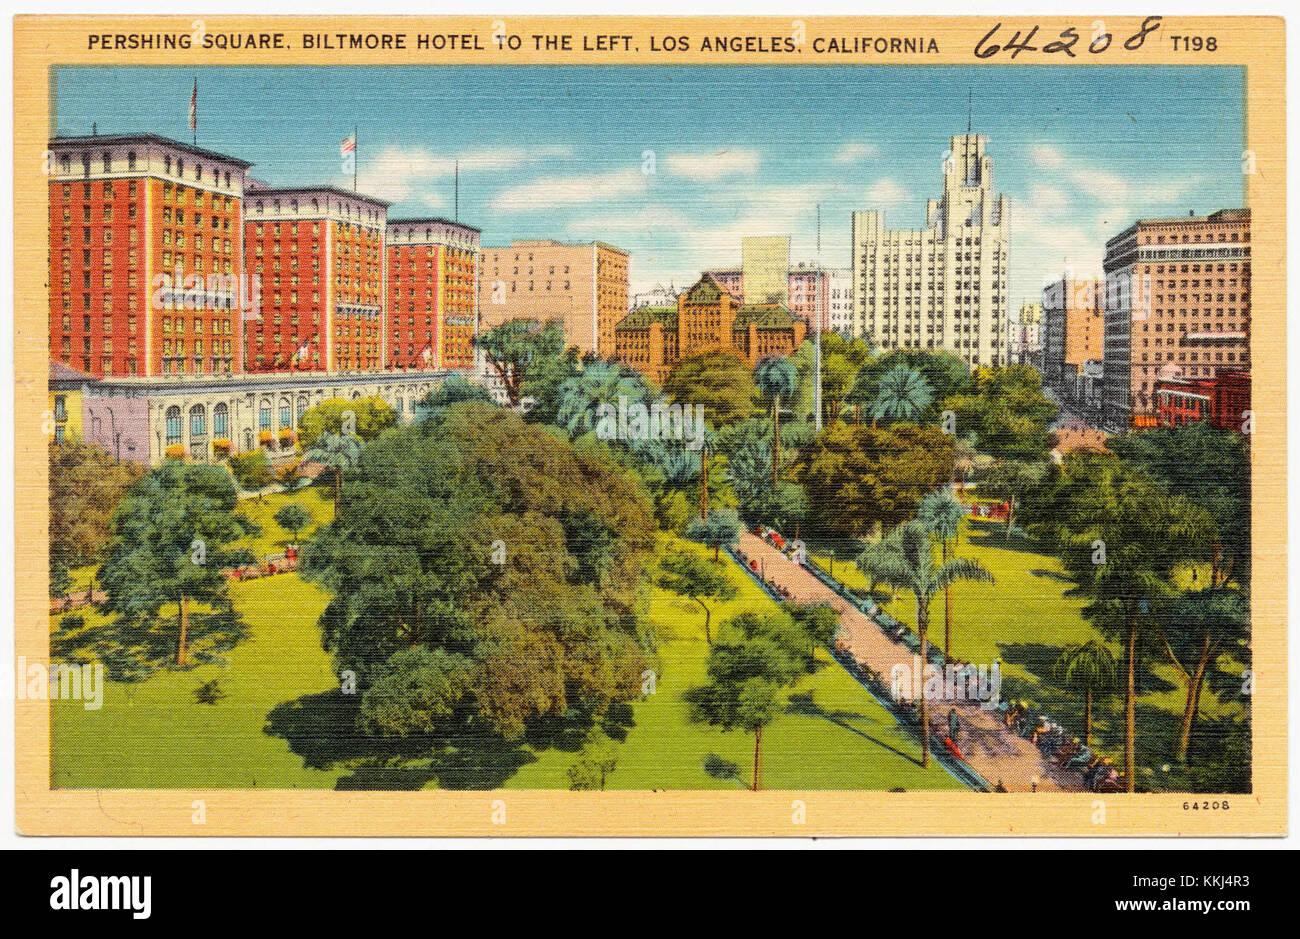 Biltmore Hotel Los Angeles Stock Photos & Biltmore Hotel ...